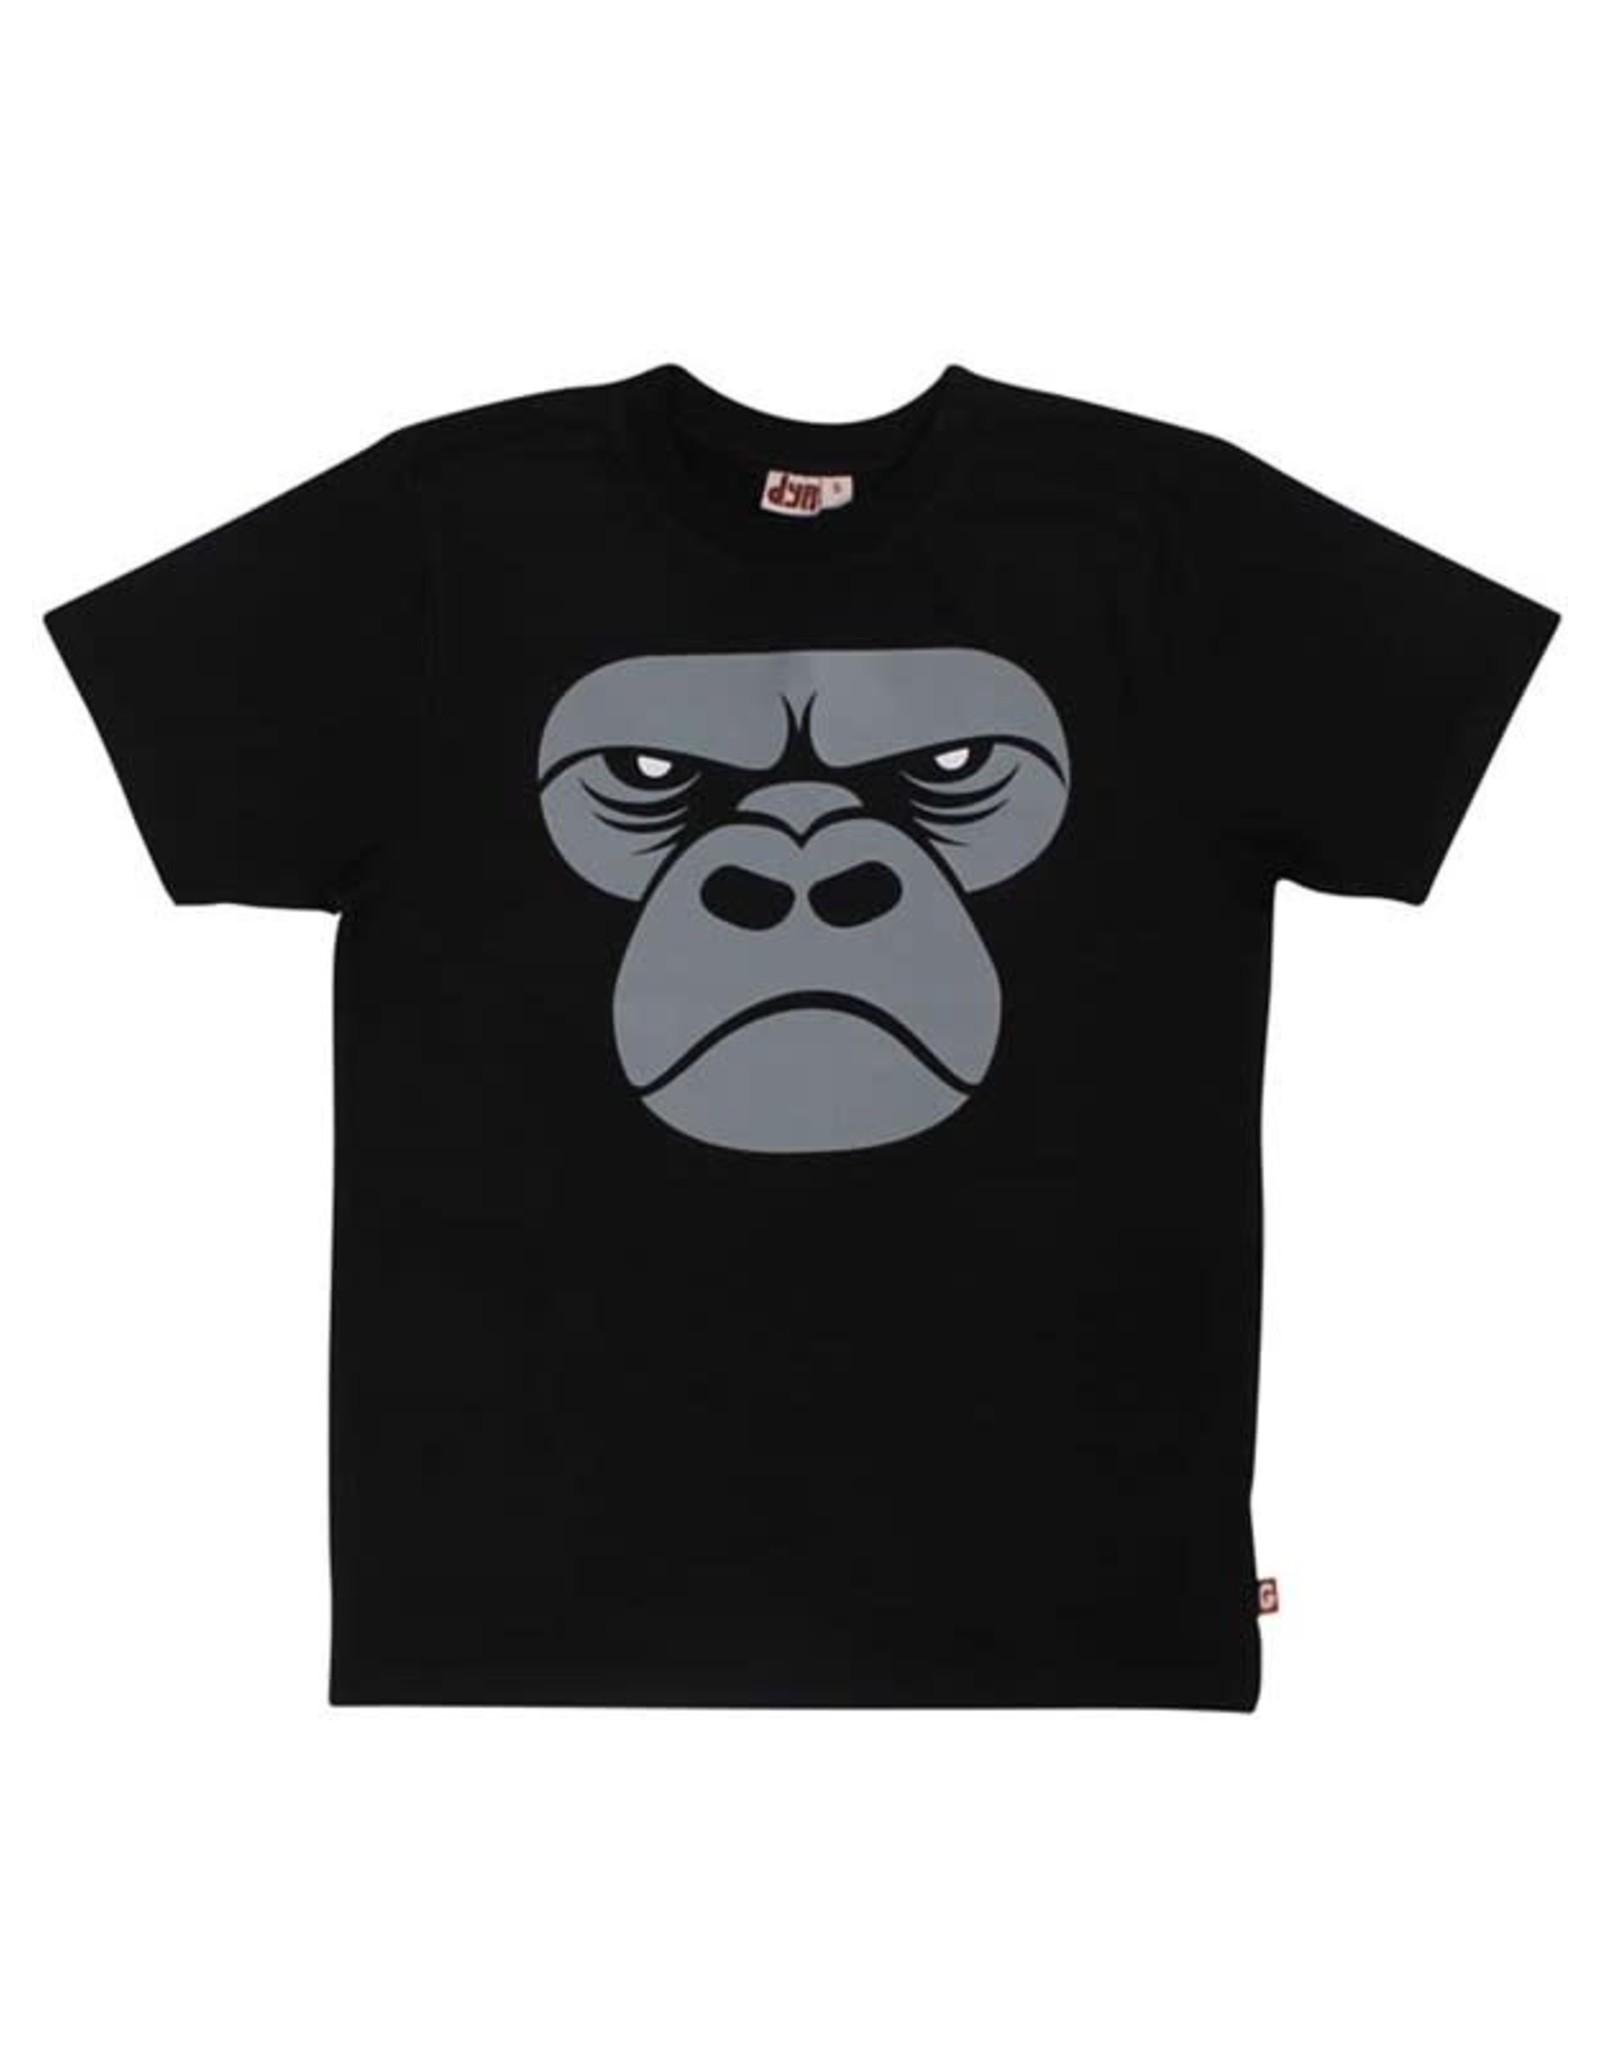 Dyr VOLWASSENEN T-shirt met grote gorilla aap